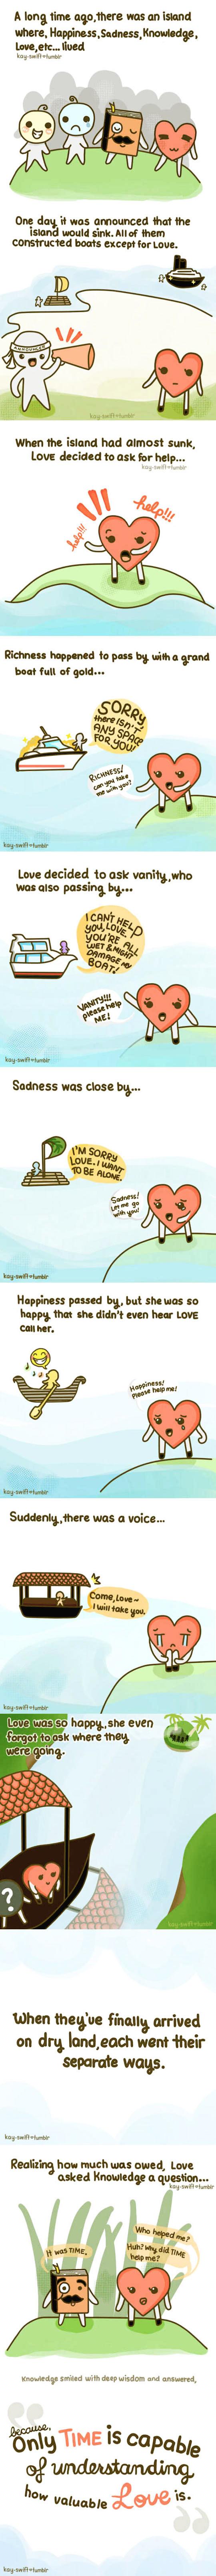 funny-cute-love-story-island-time-art